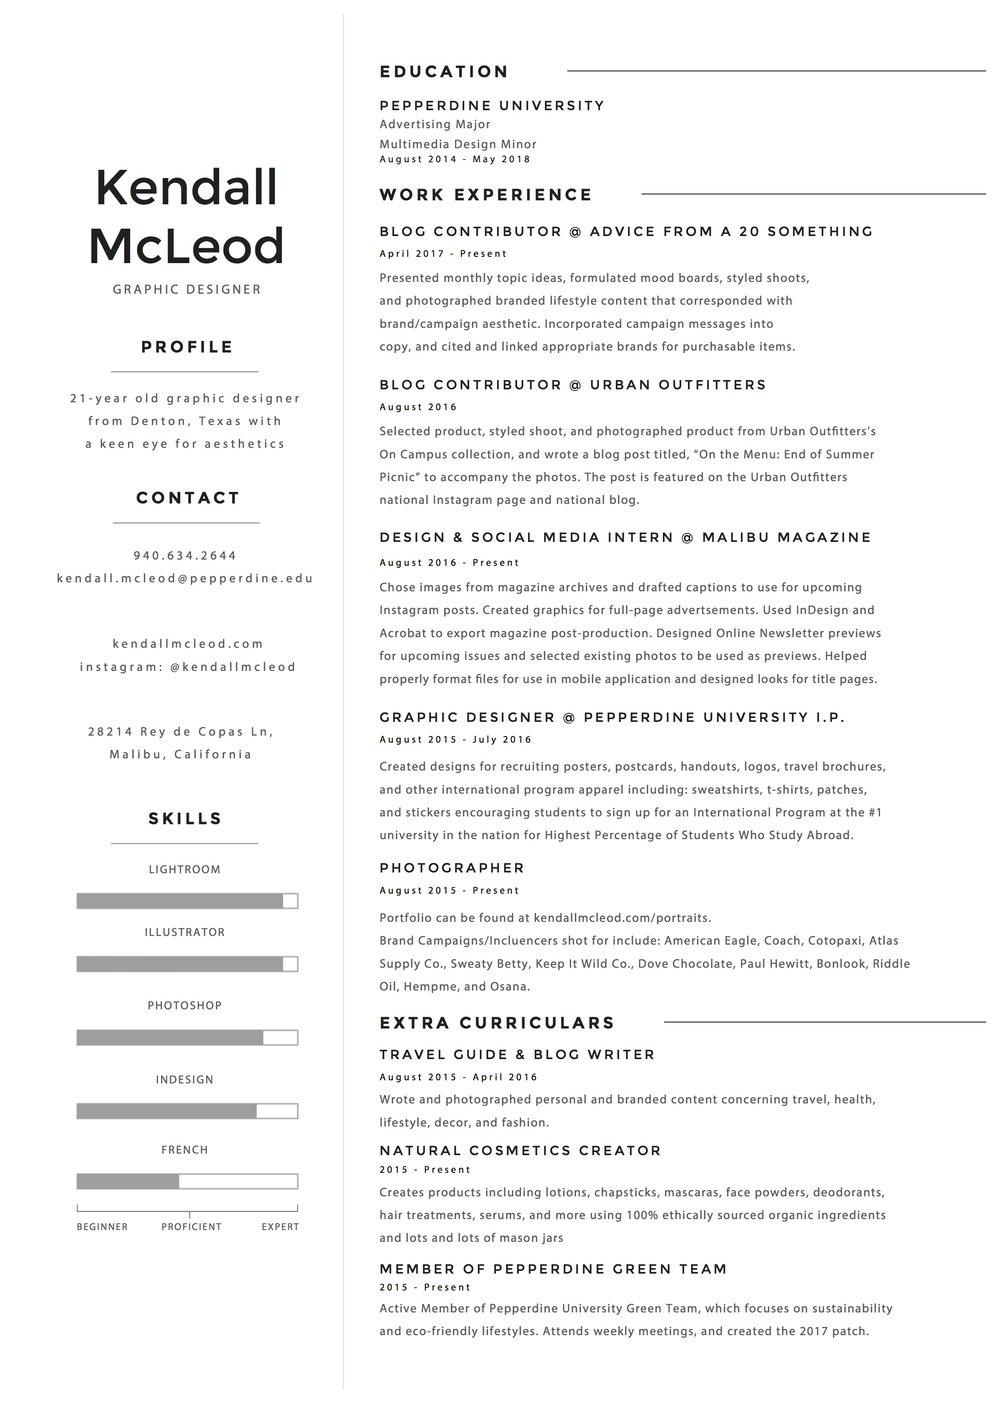 Kendall McLeod Resume 2017.jpg